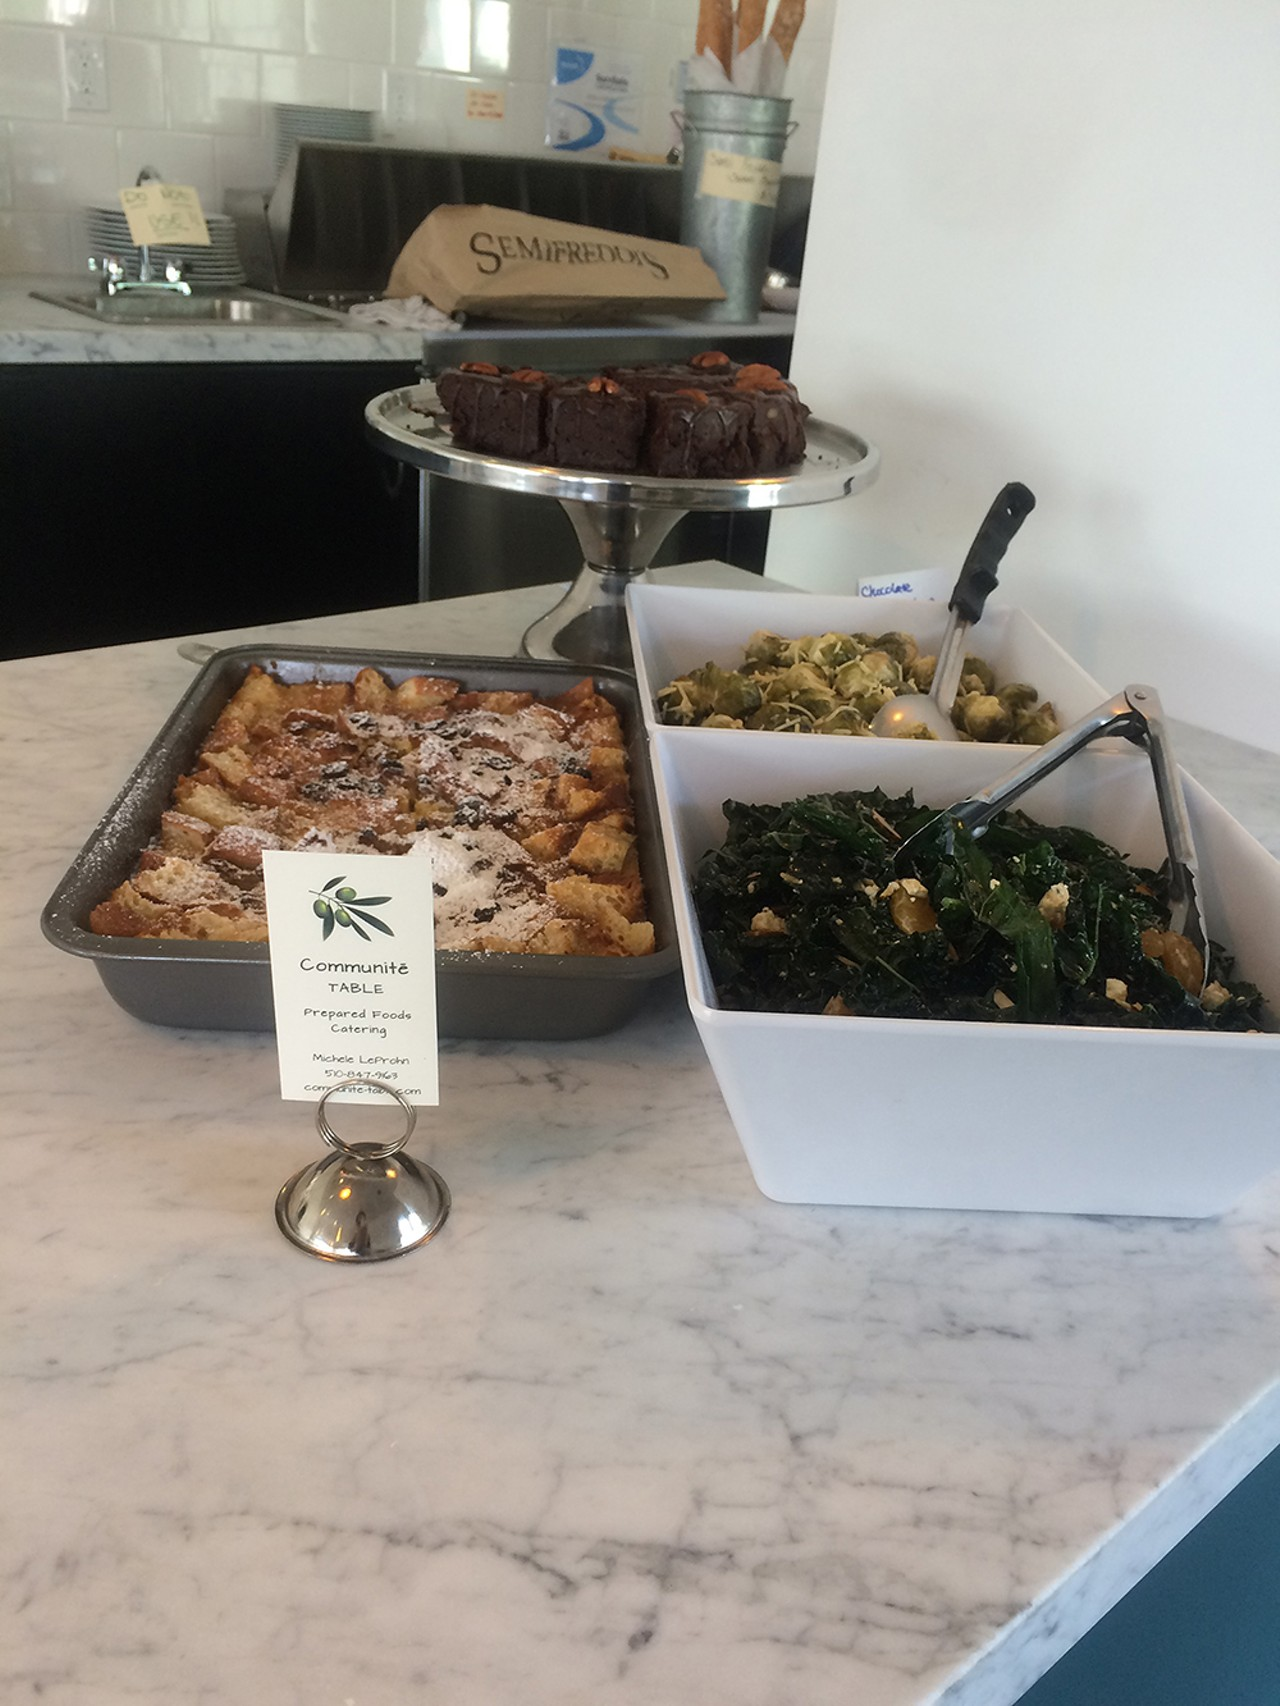 After Years Berkeleys Taiwan Restaurant Is Closing East Bay - Communite table